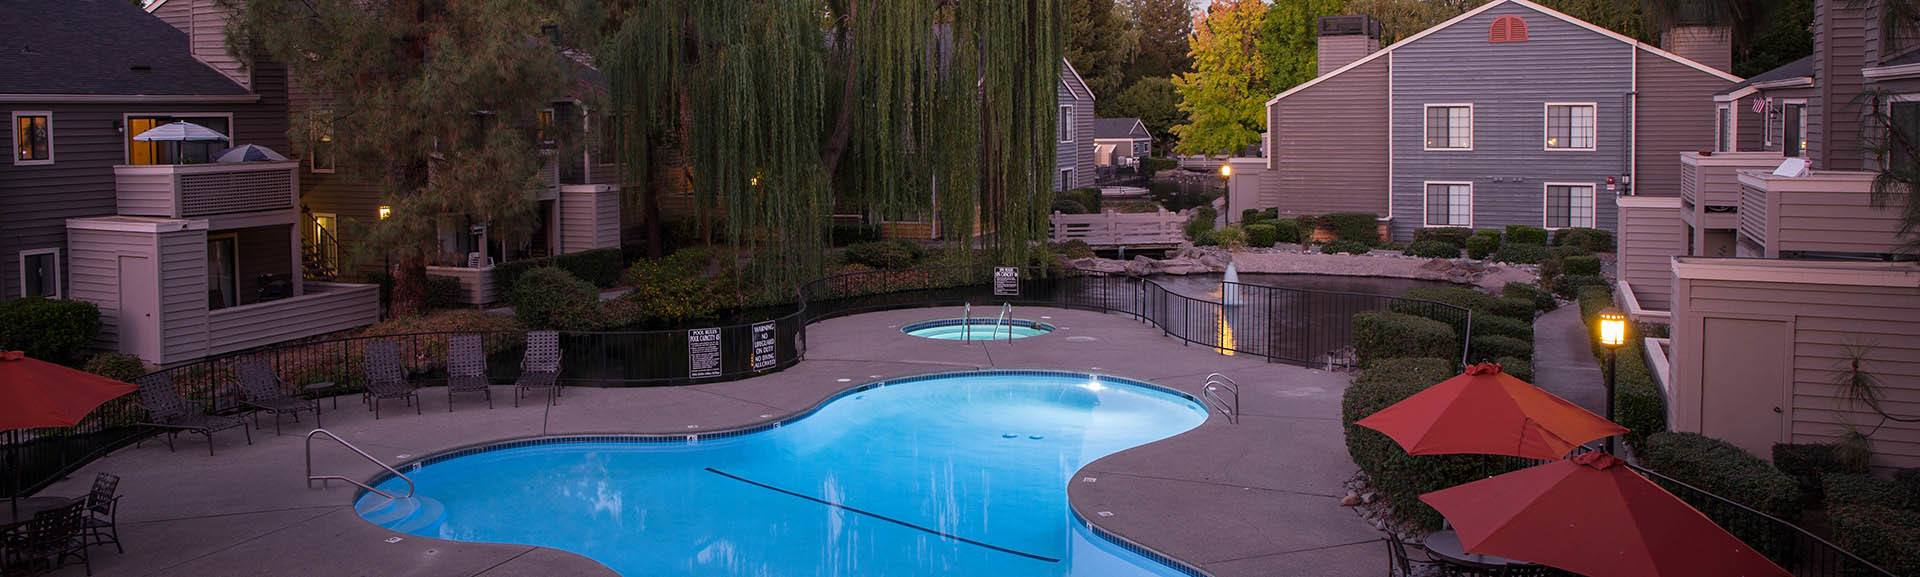 Amenities at Hidden Lake Condominium Rentals in Sacramento, California